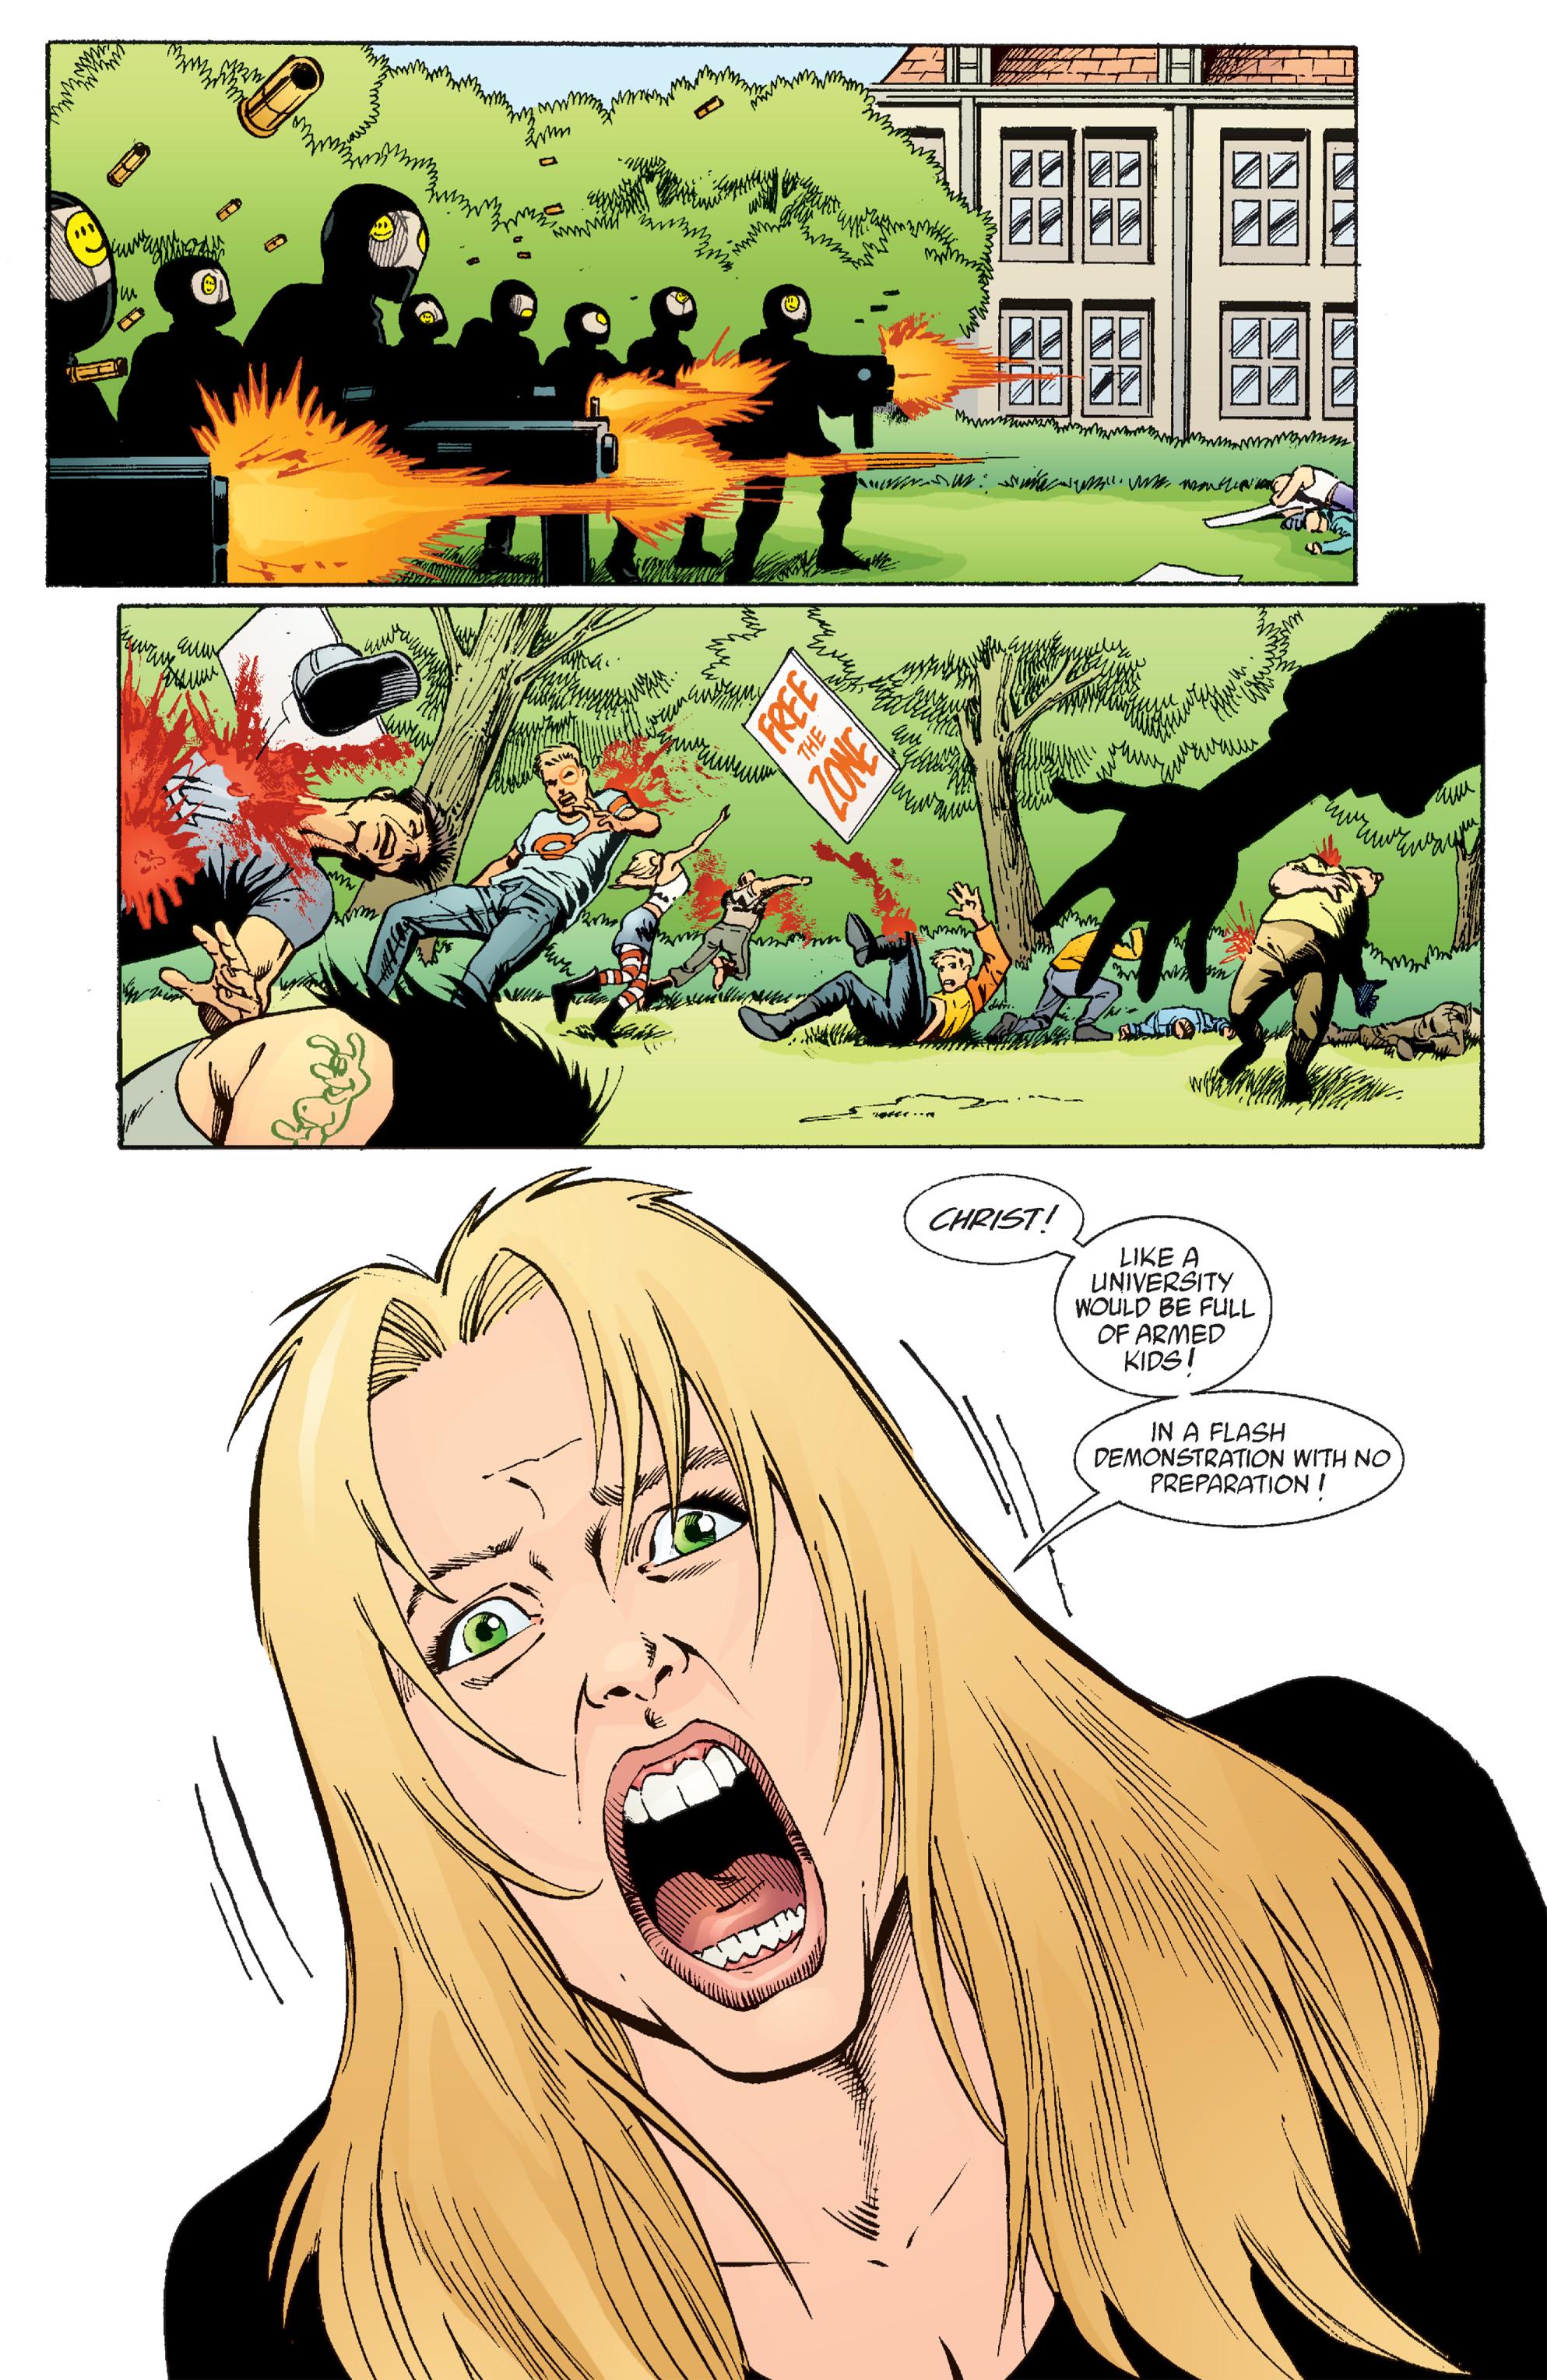 Read online Transmetropolitan comic -  Issue #57 - 6